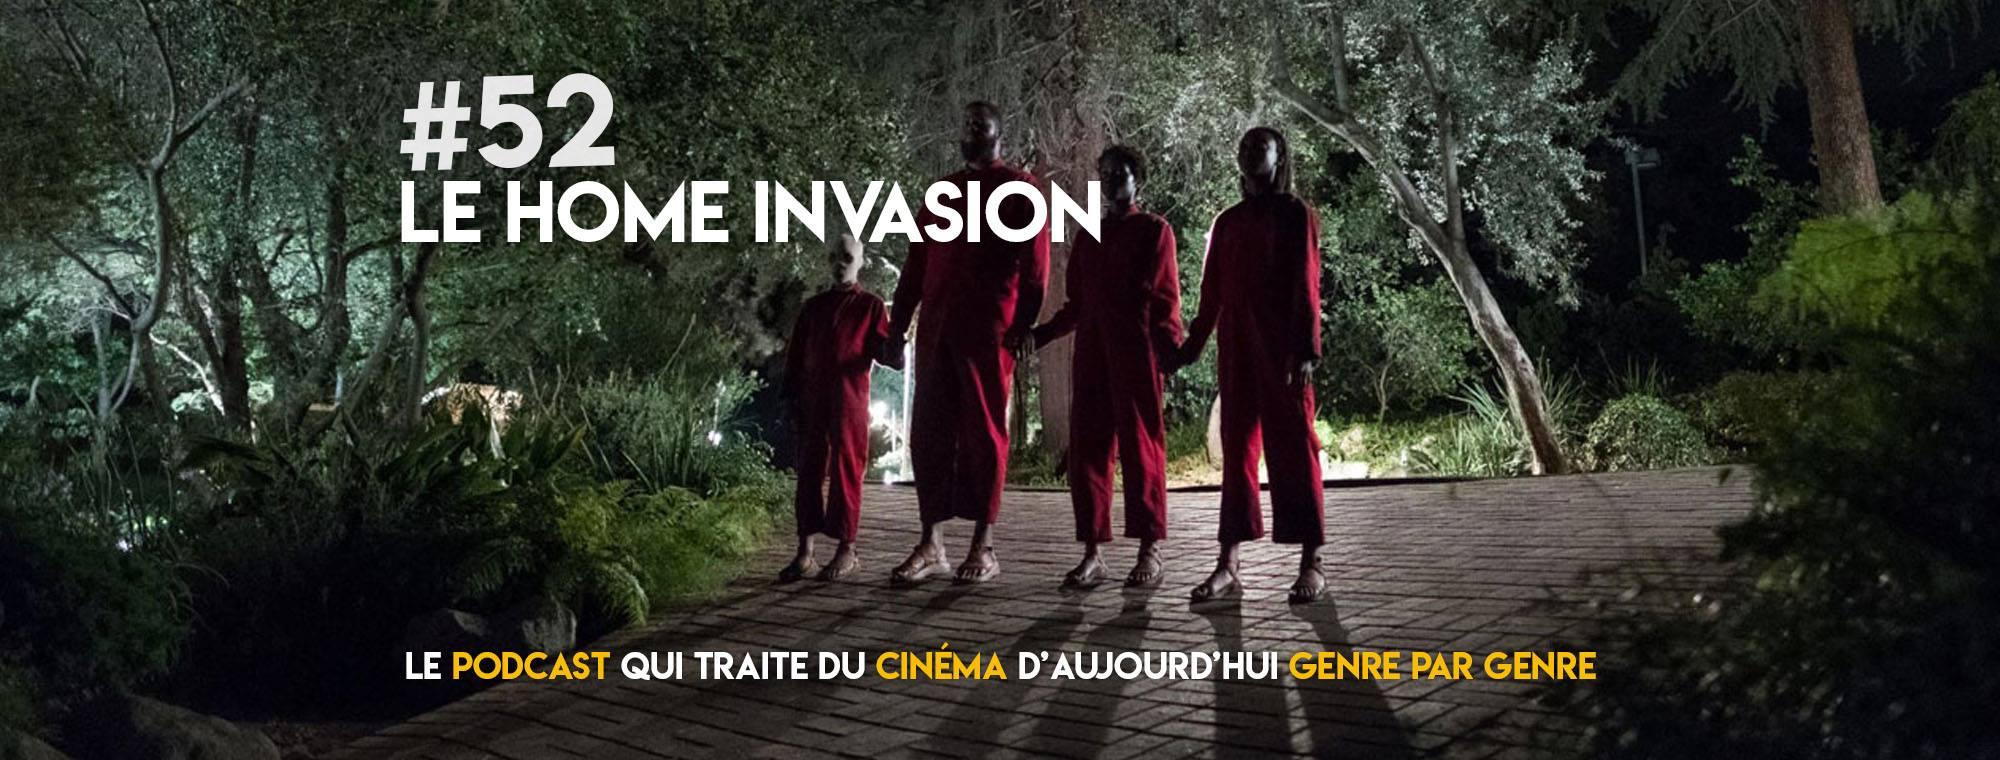 Parlons Péloches - #52 Le home invasion